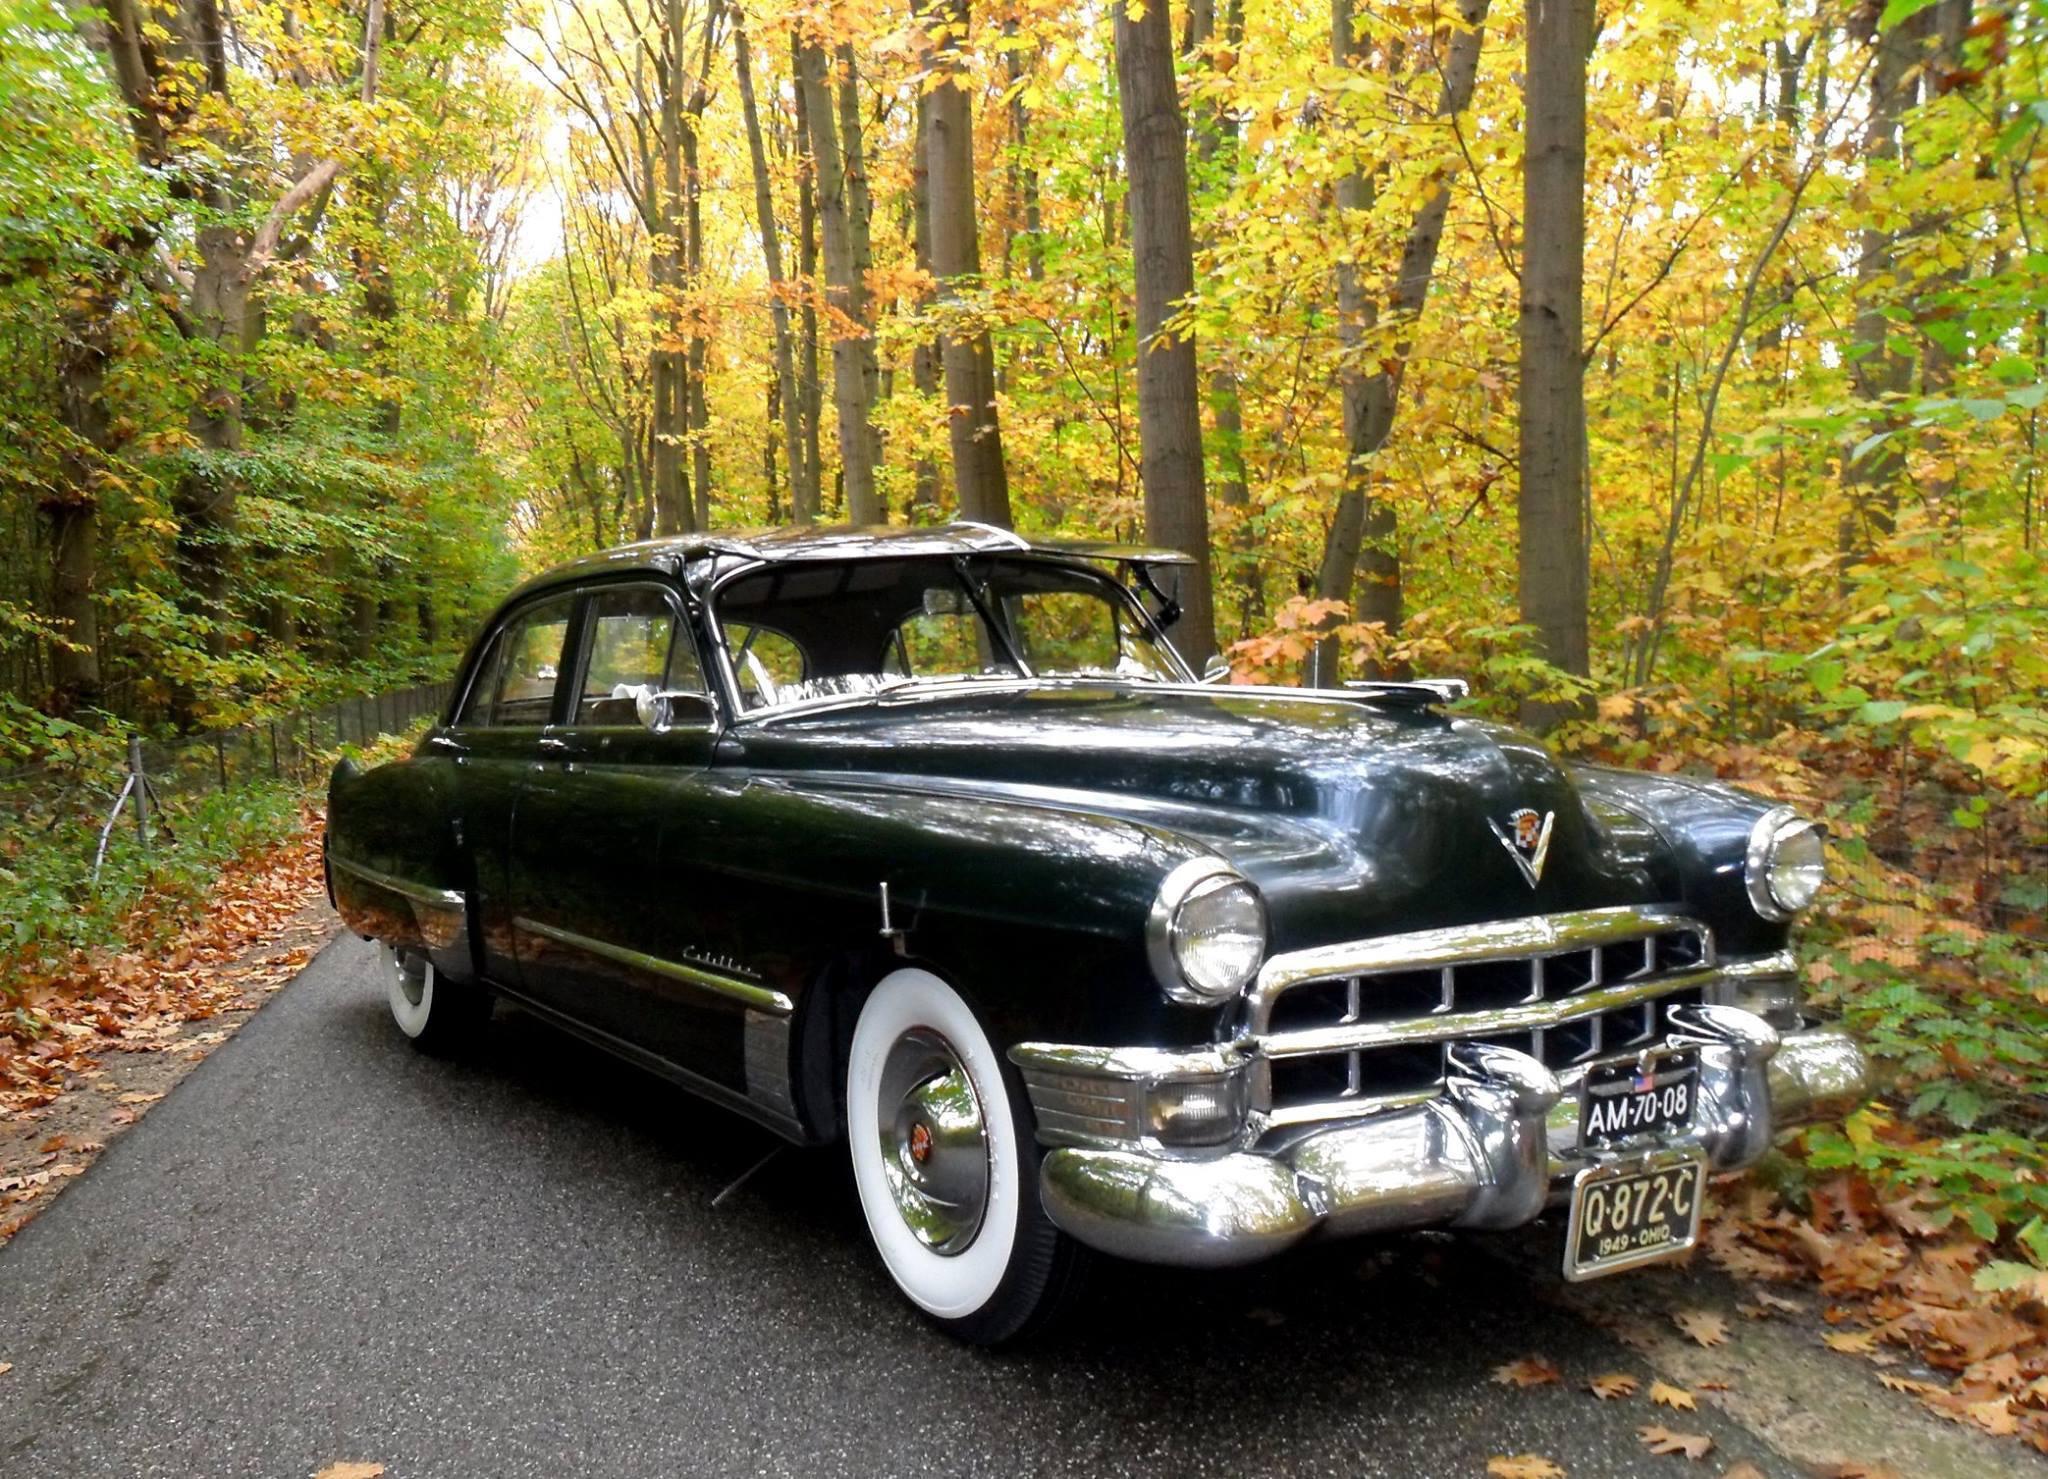 The 1949 Cadillac Sedan a True American Classic